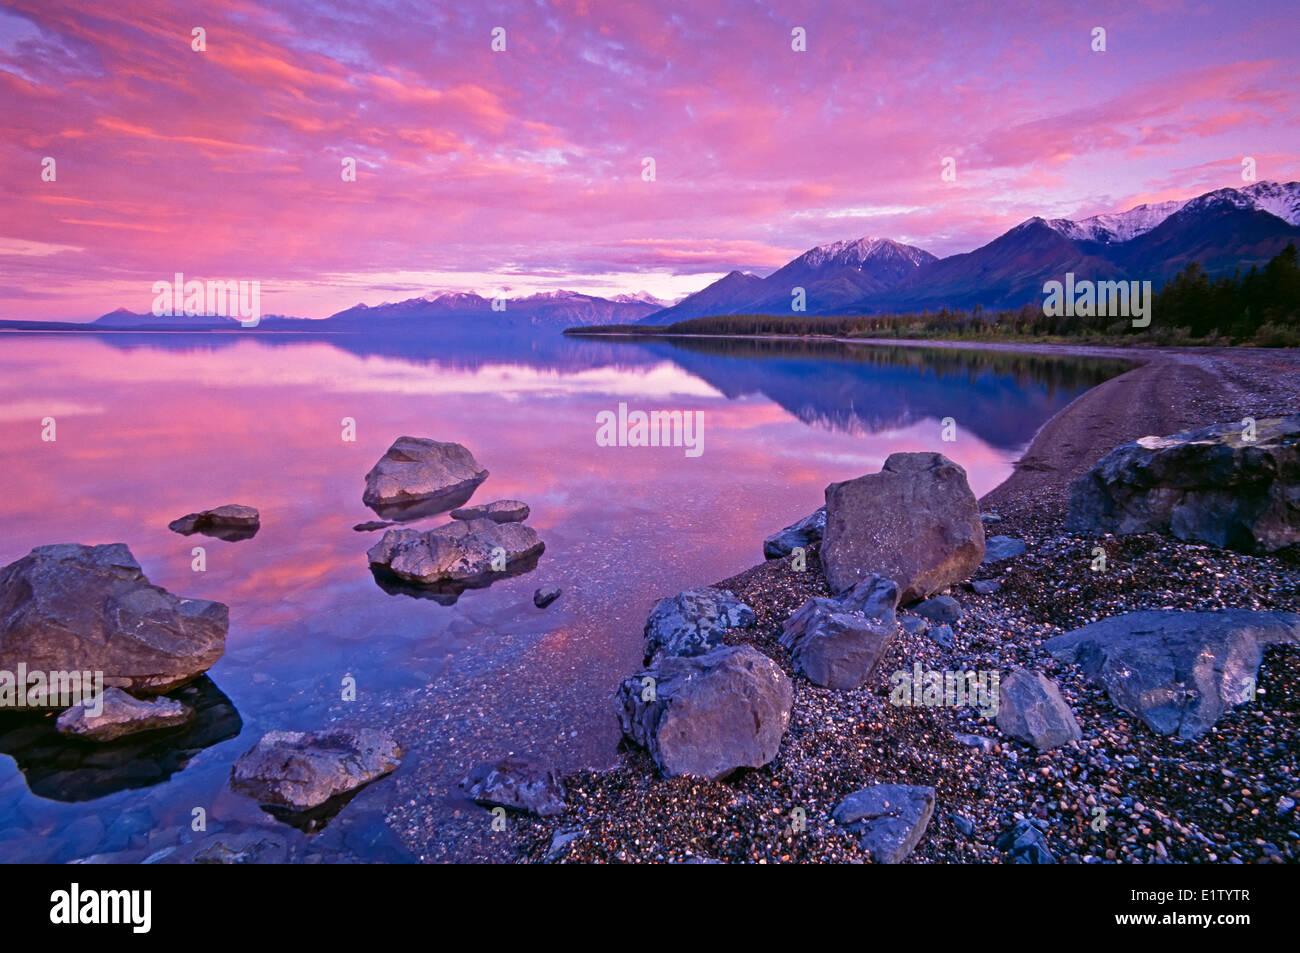 Kluane Lake at sunset, Yukon Territory, Canada - Stock Image